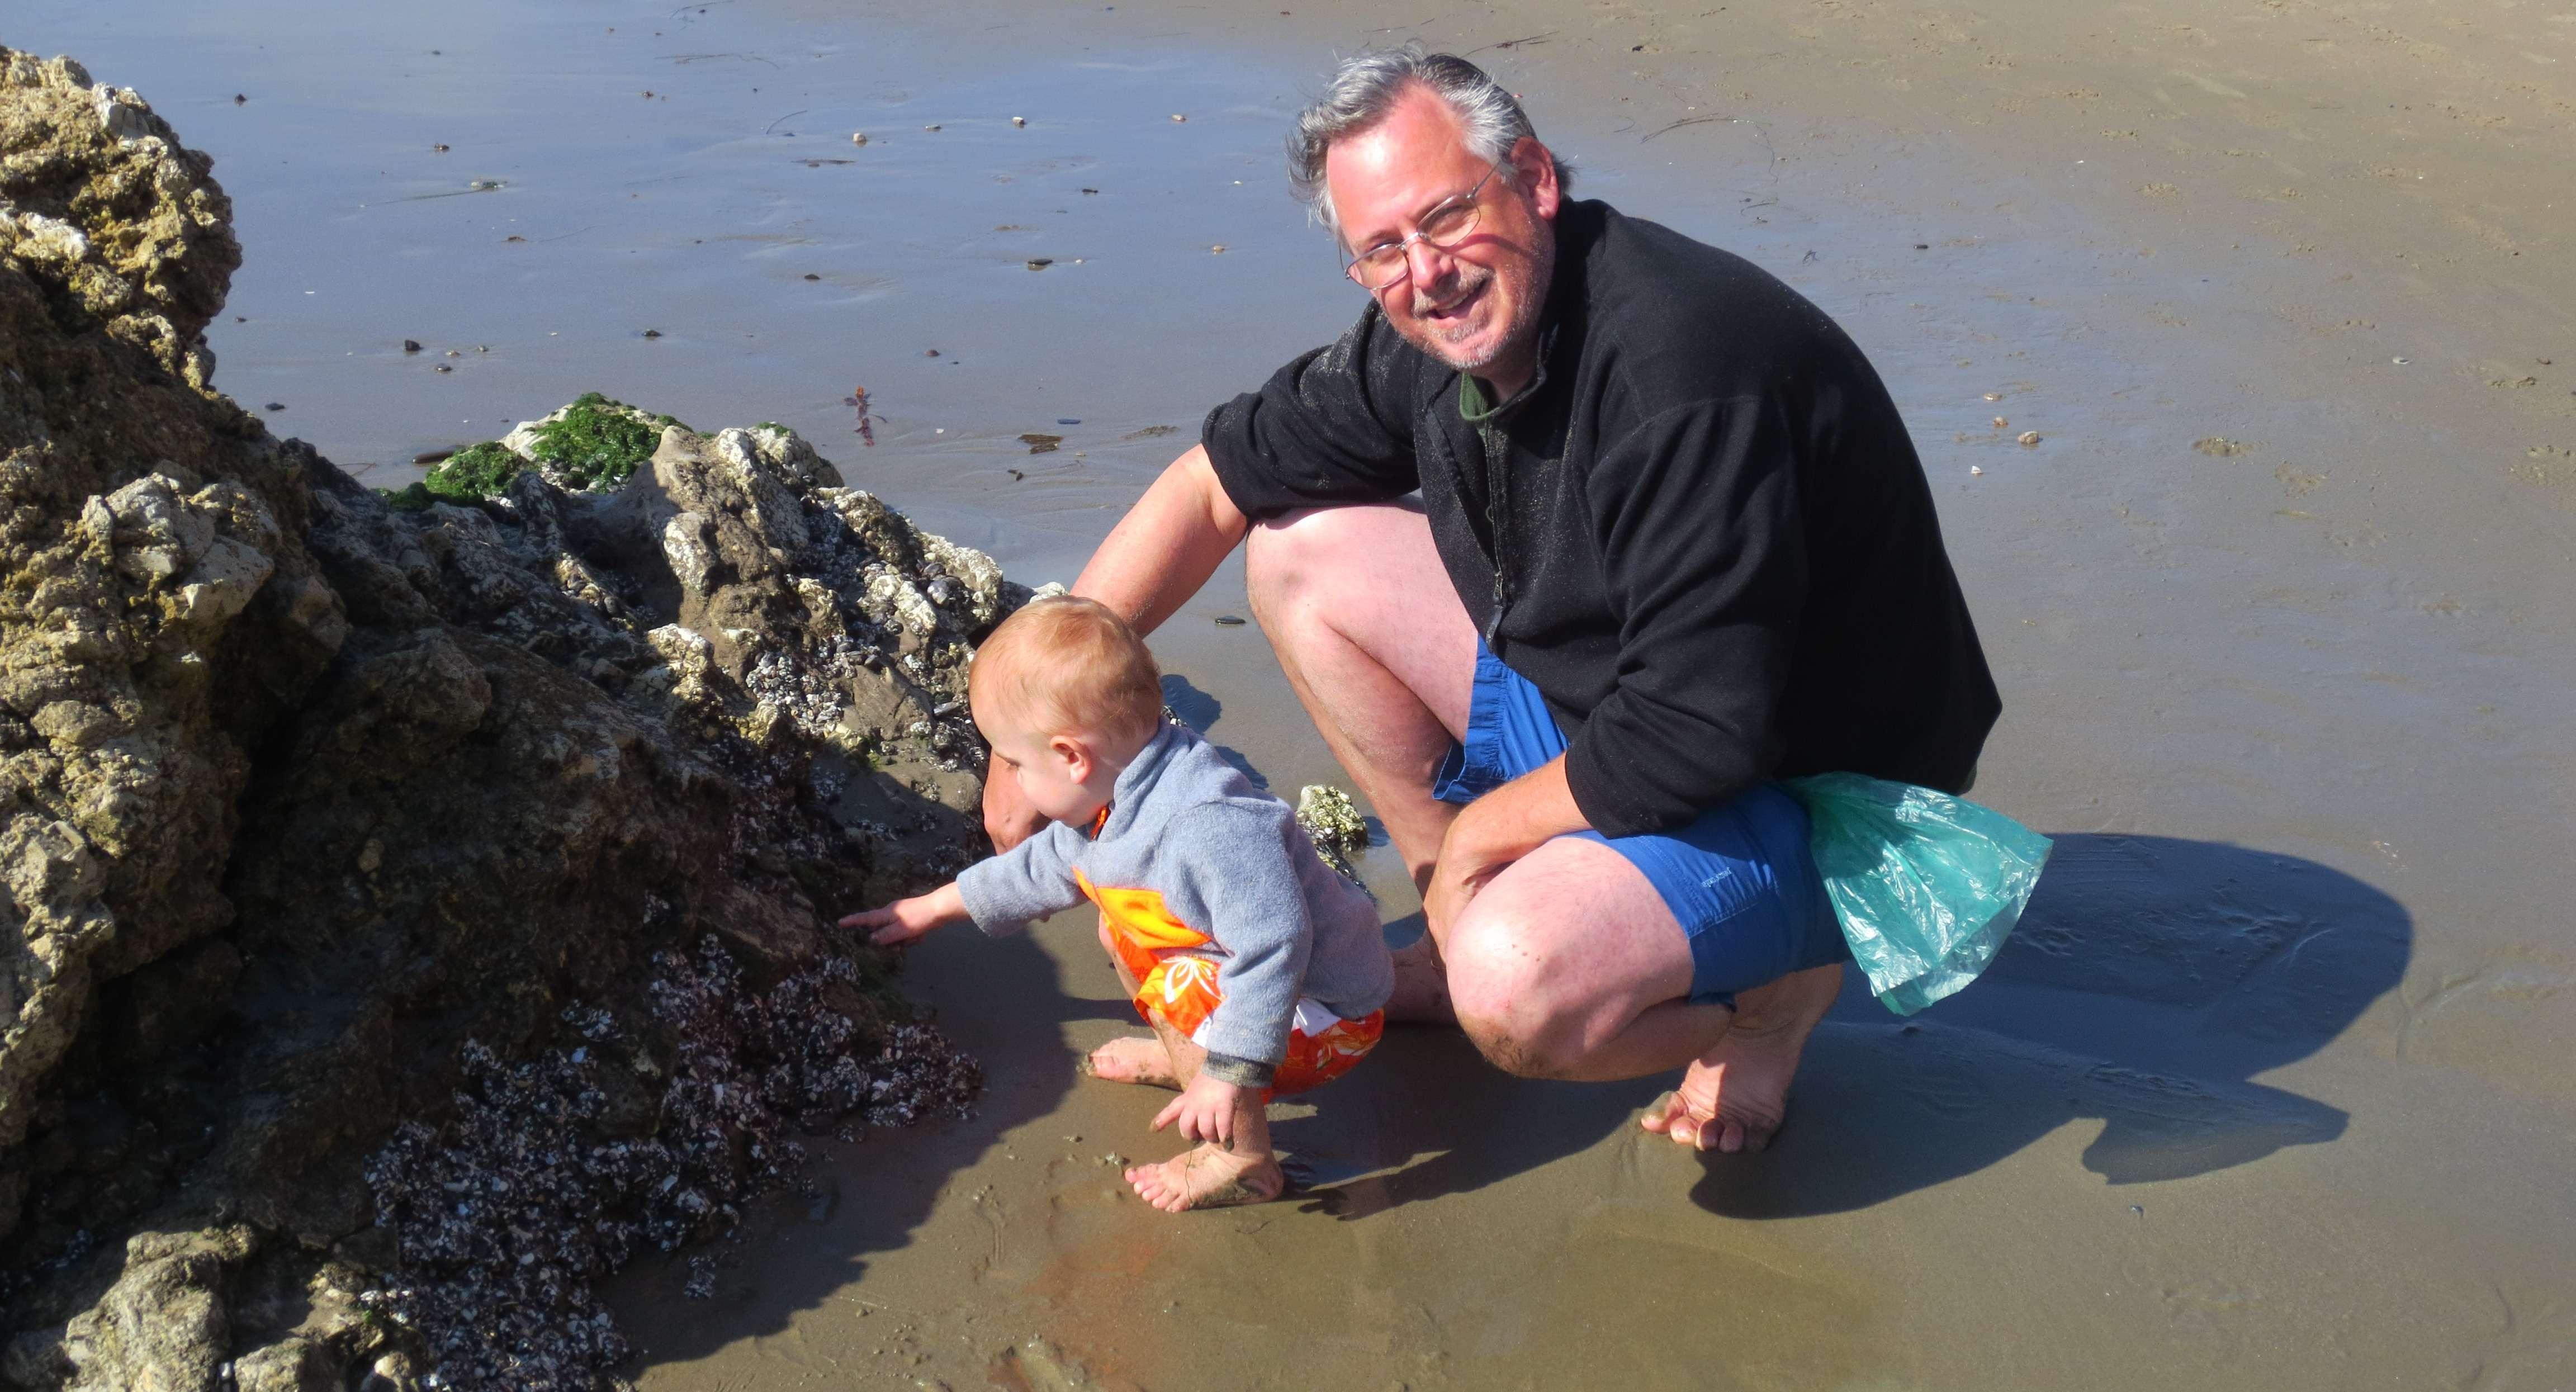 toddler and man near ocean rocks